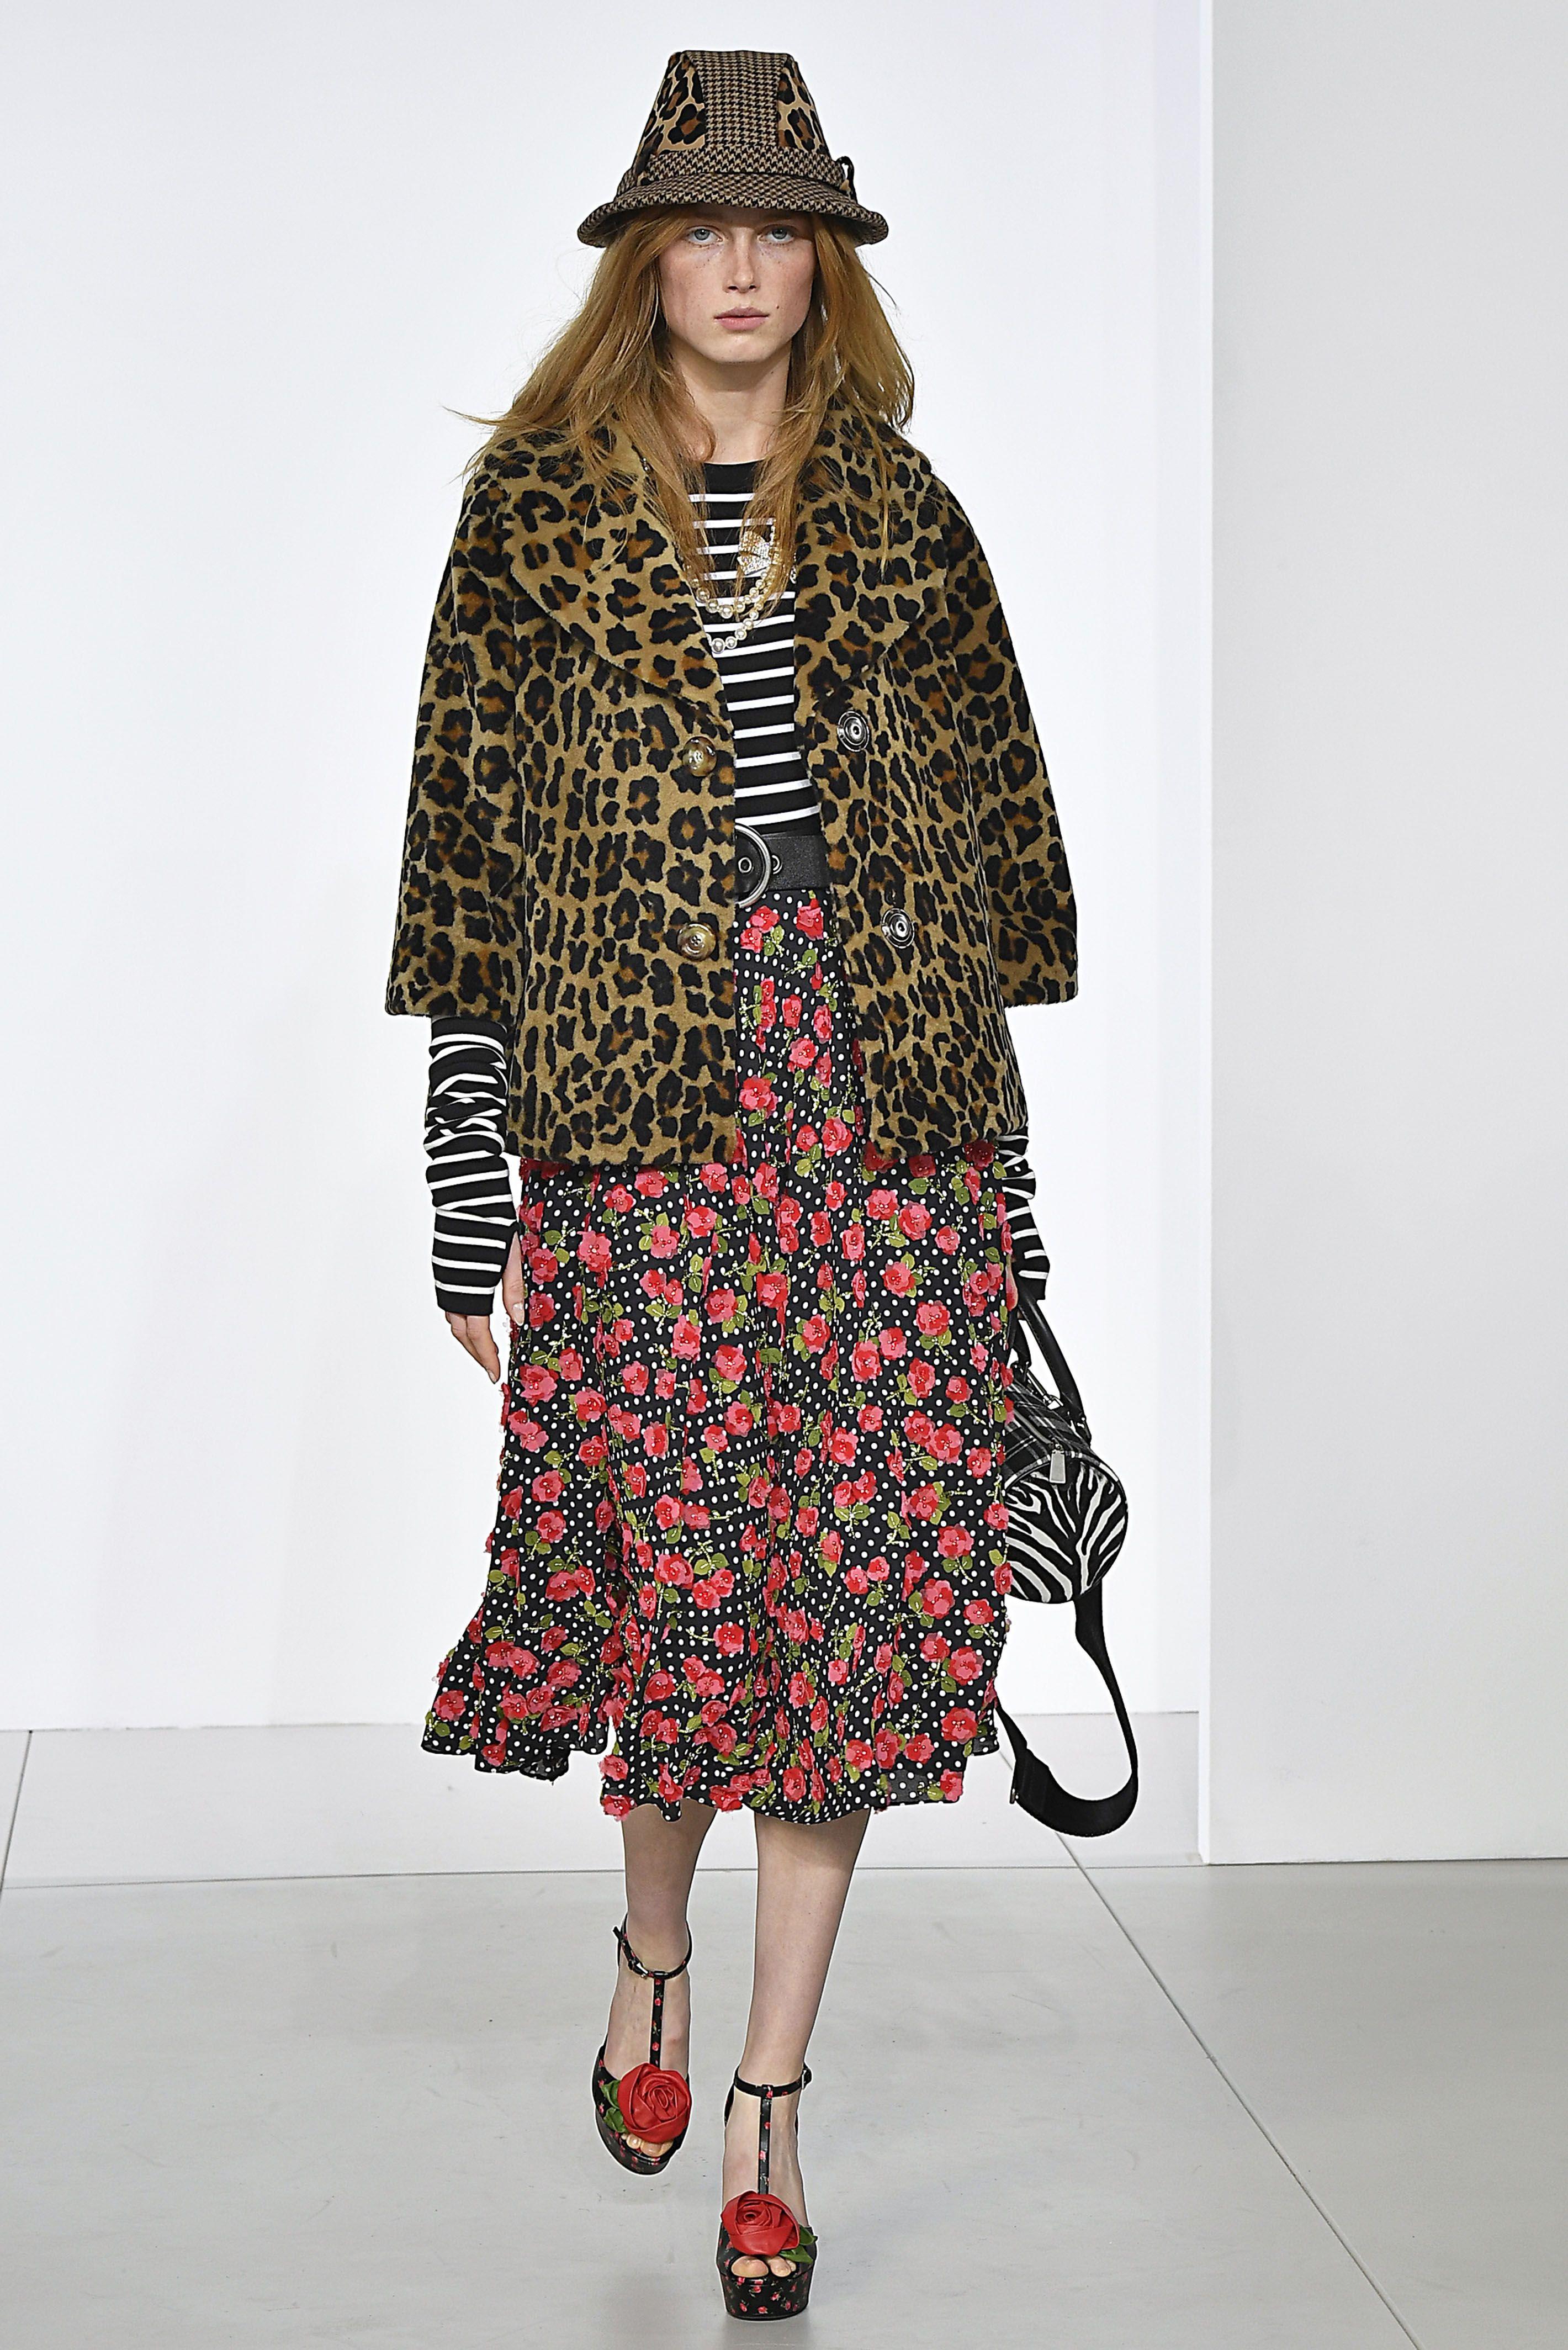 Autumn Winter 2018 fashion trends - leopard print